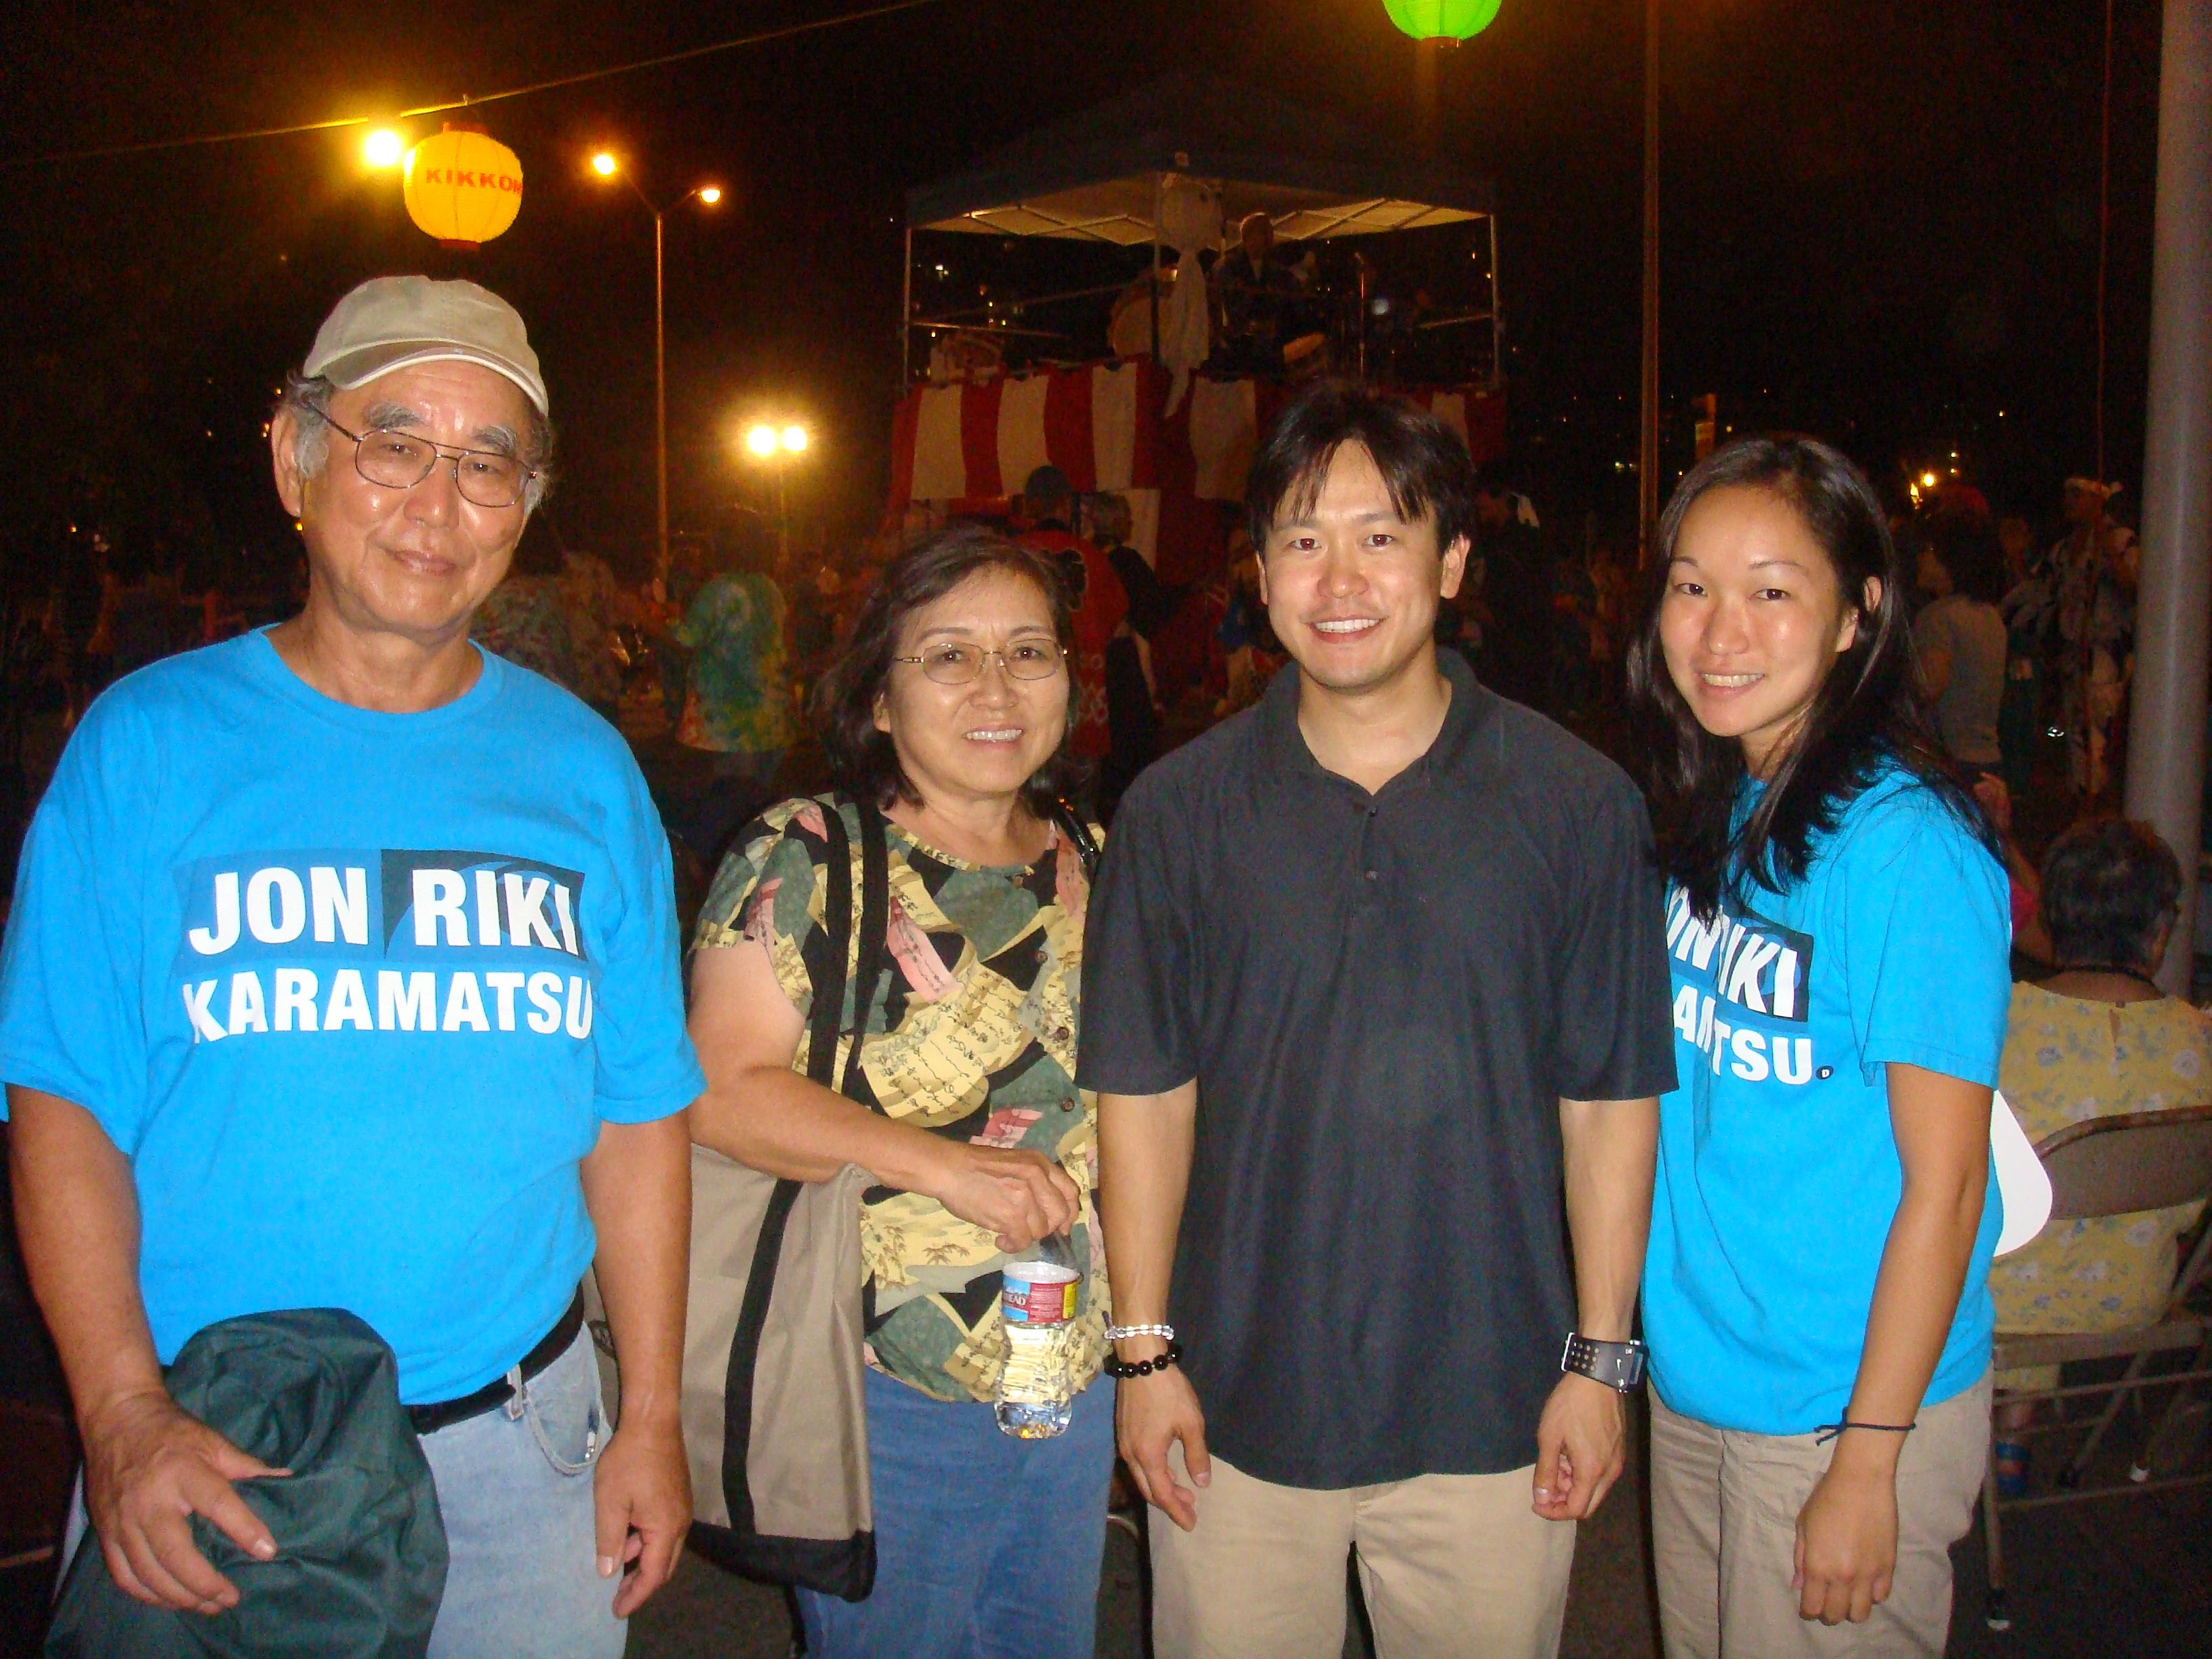 My father Richard, mother Laraine, myself, and sister Lara